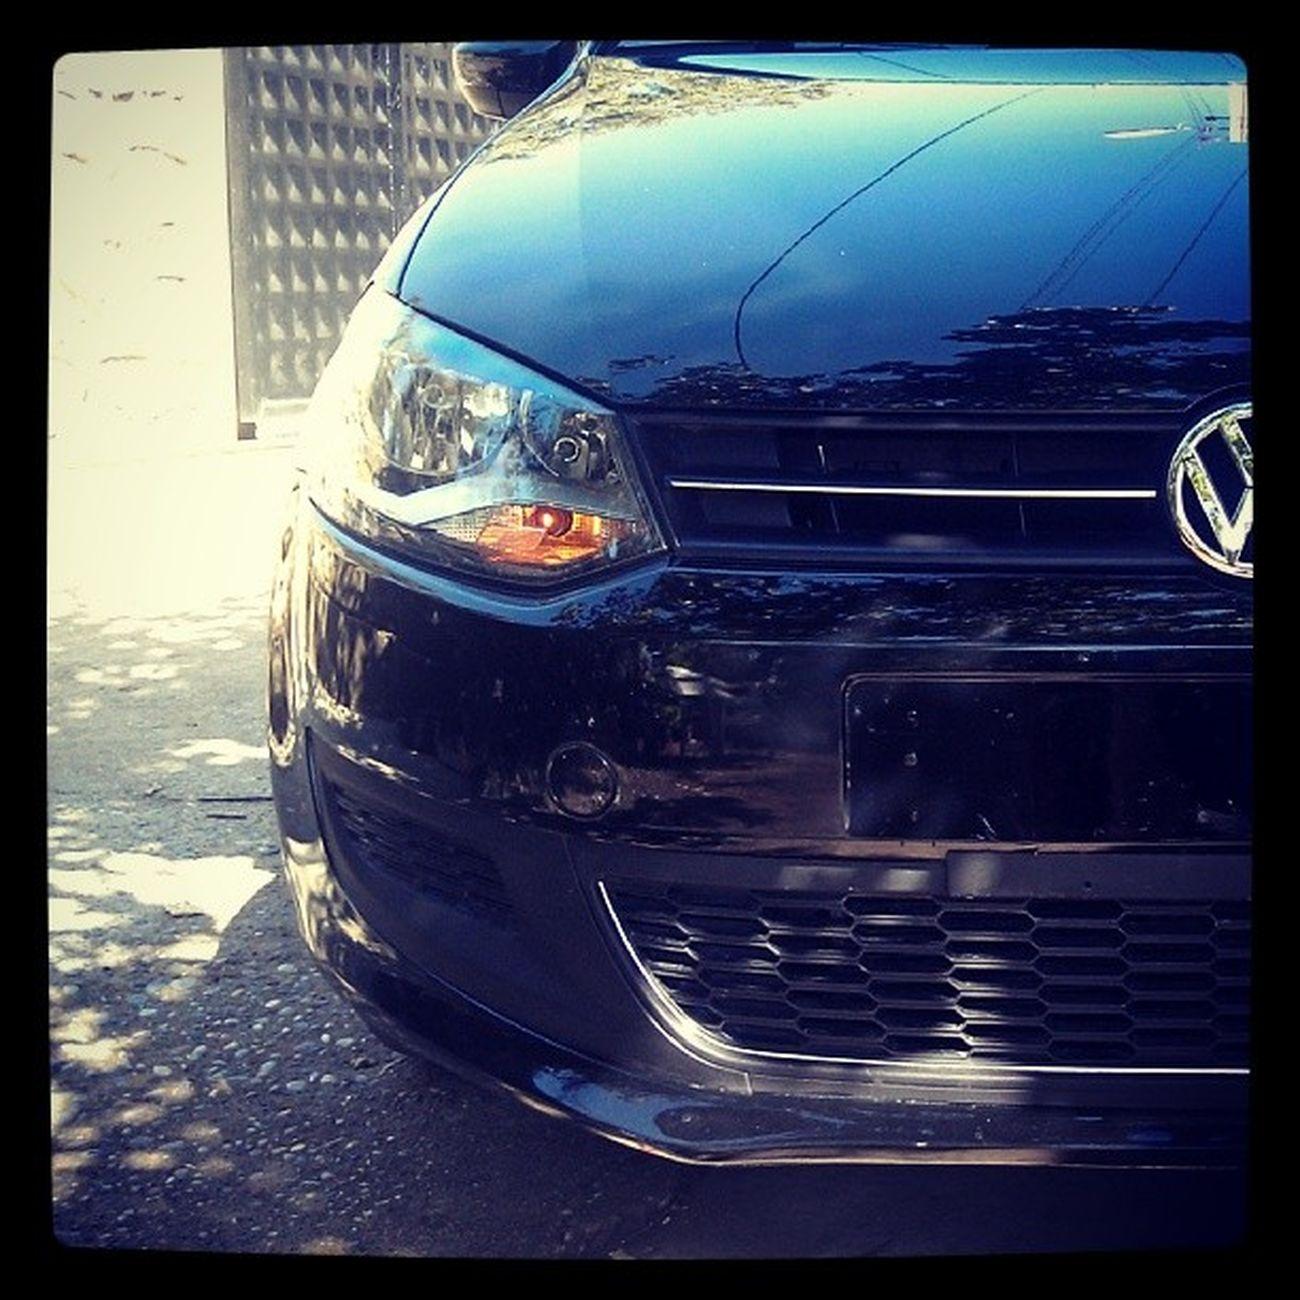 VW Vwlove Anahtar Blue polo 6r htc canon vwpoloclub vwpolom Adana osmaniye Düziçi instagram instavolkswagen igers love black siyah 80DT515 amerikanpark